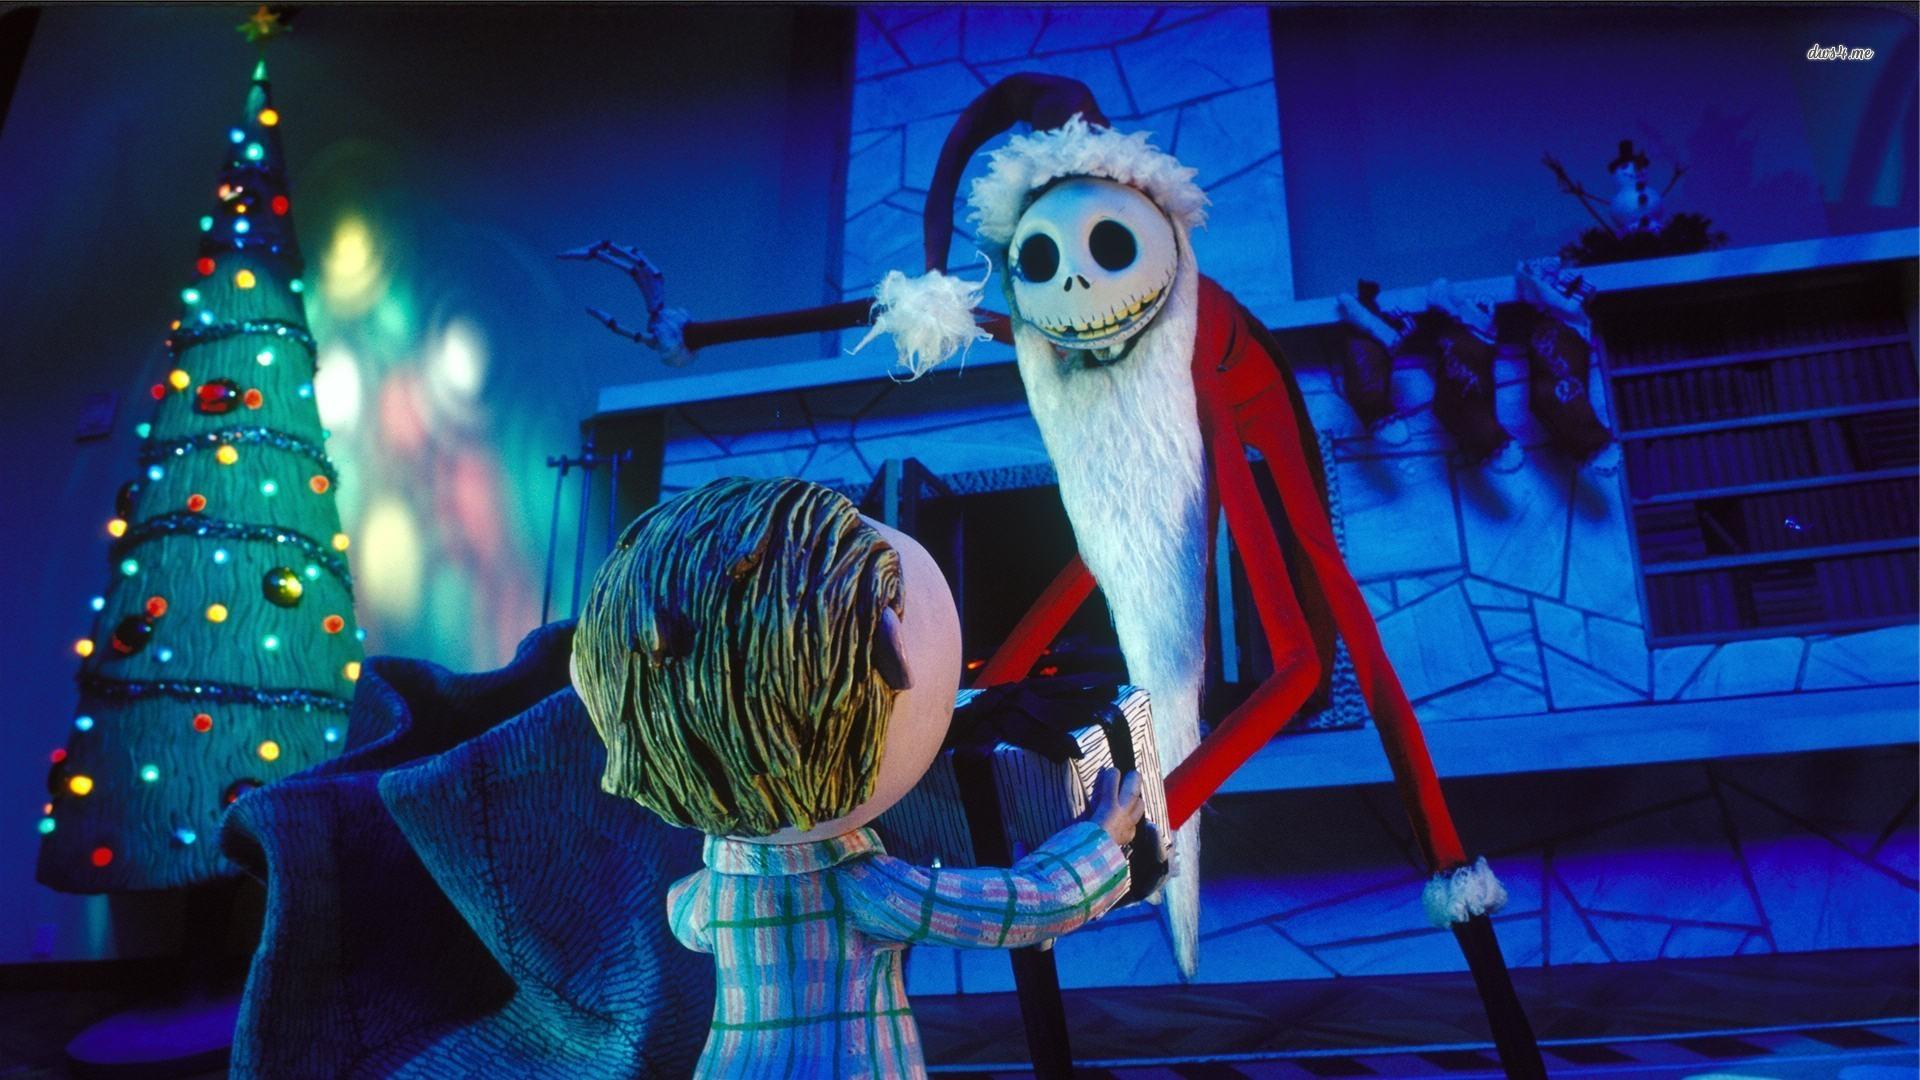 Nightmare Before Christmas wallpaper 1280×800 Nightmare Before .